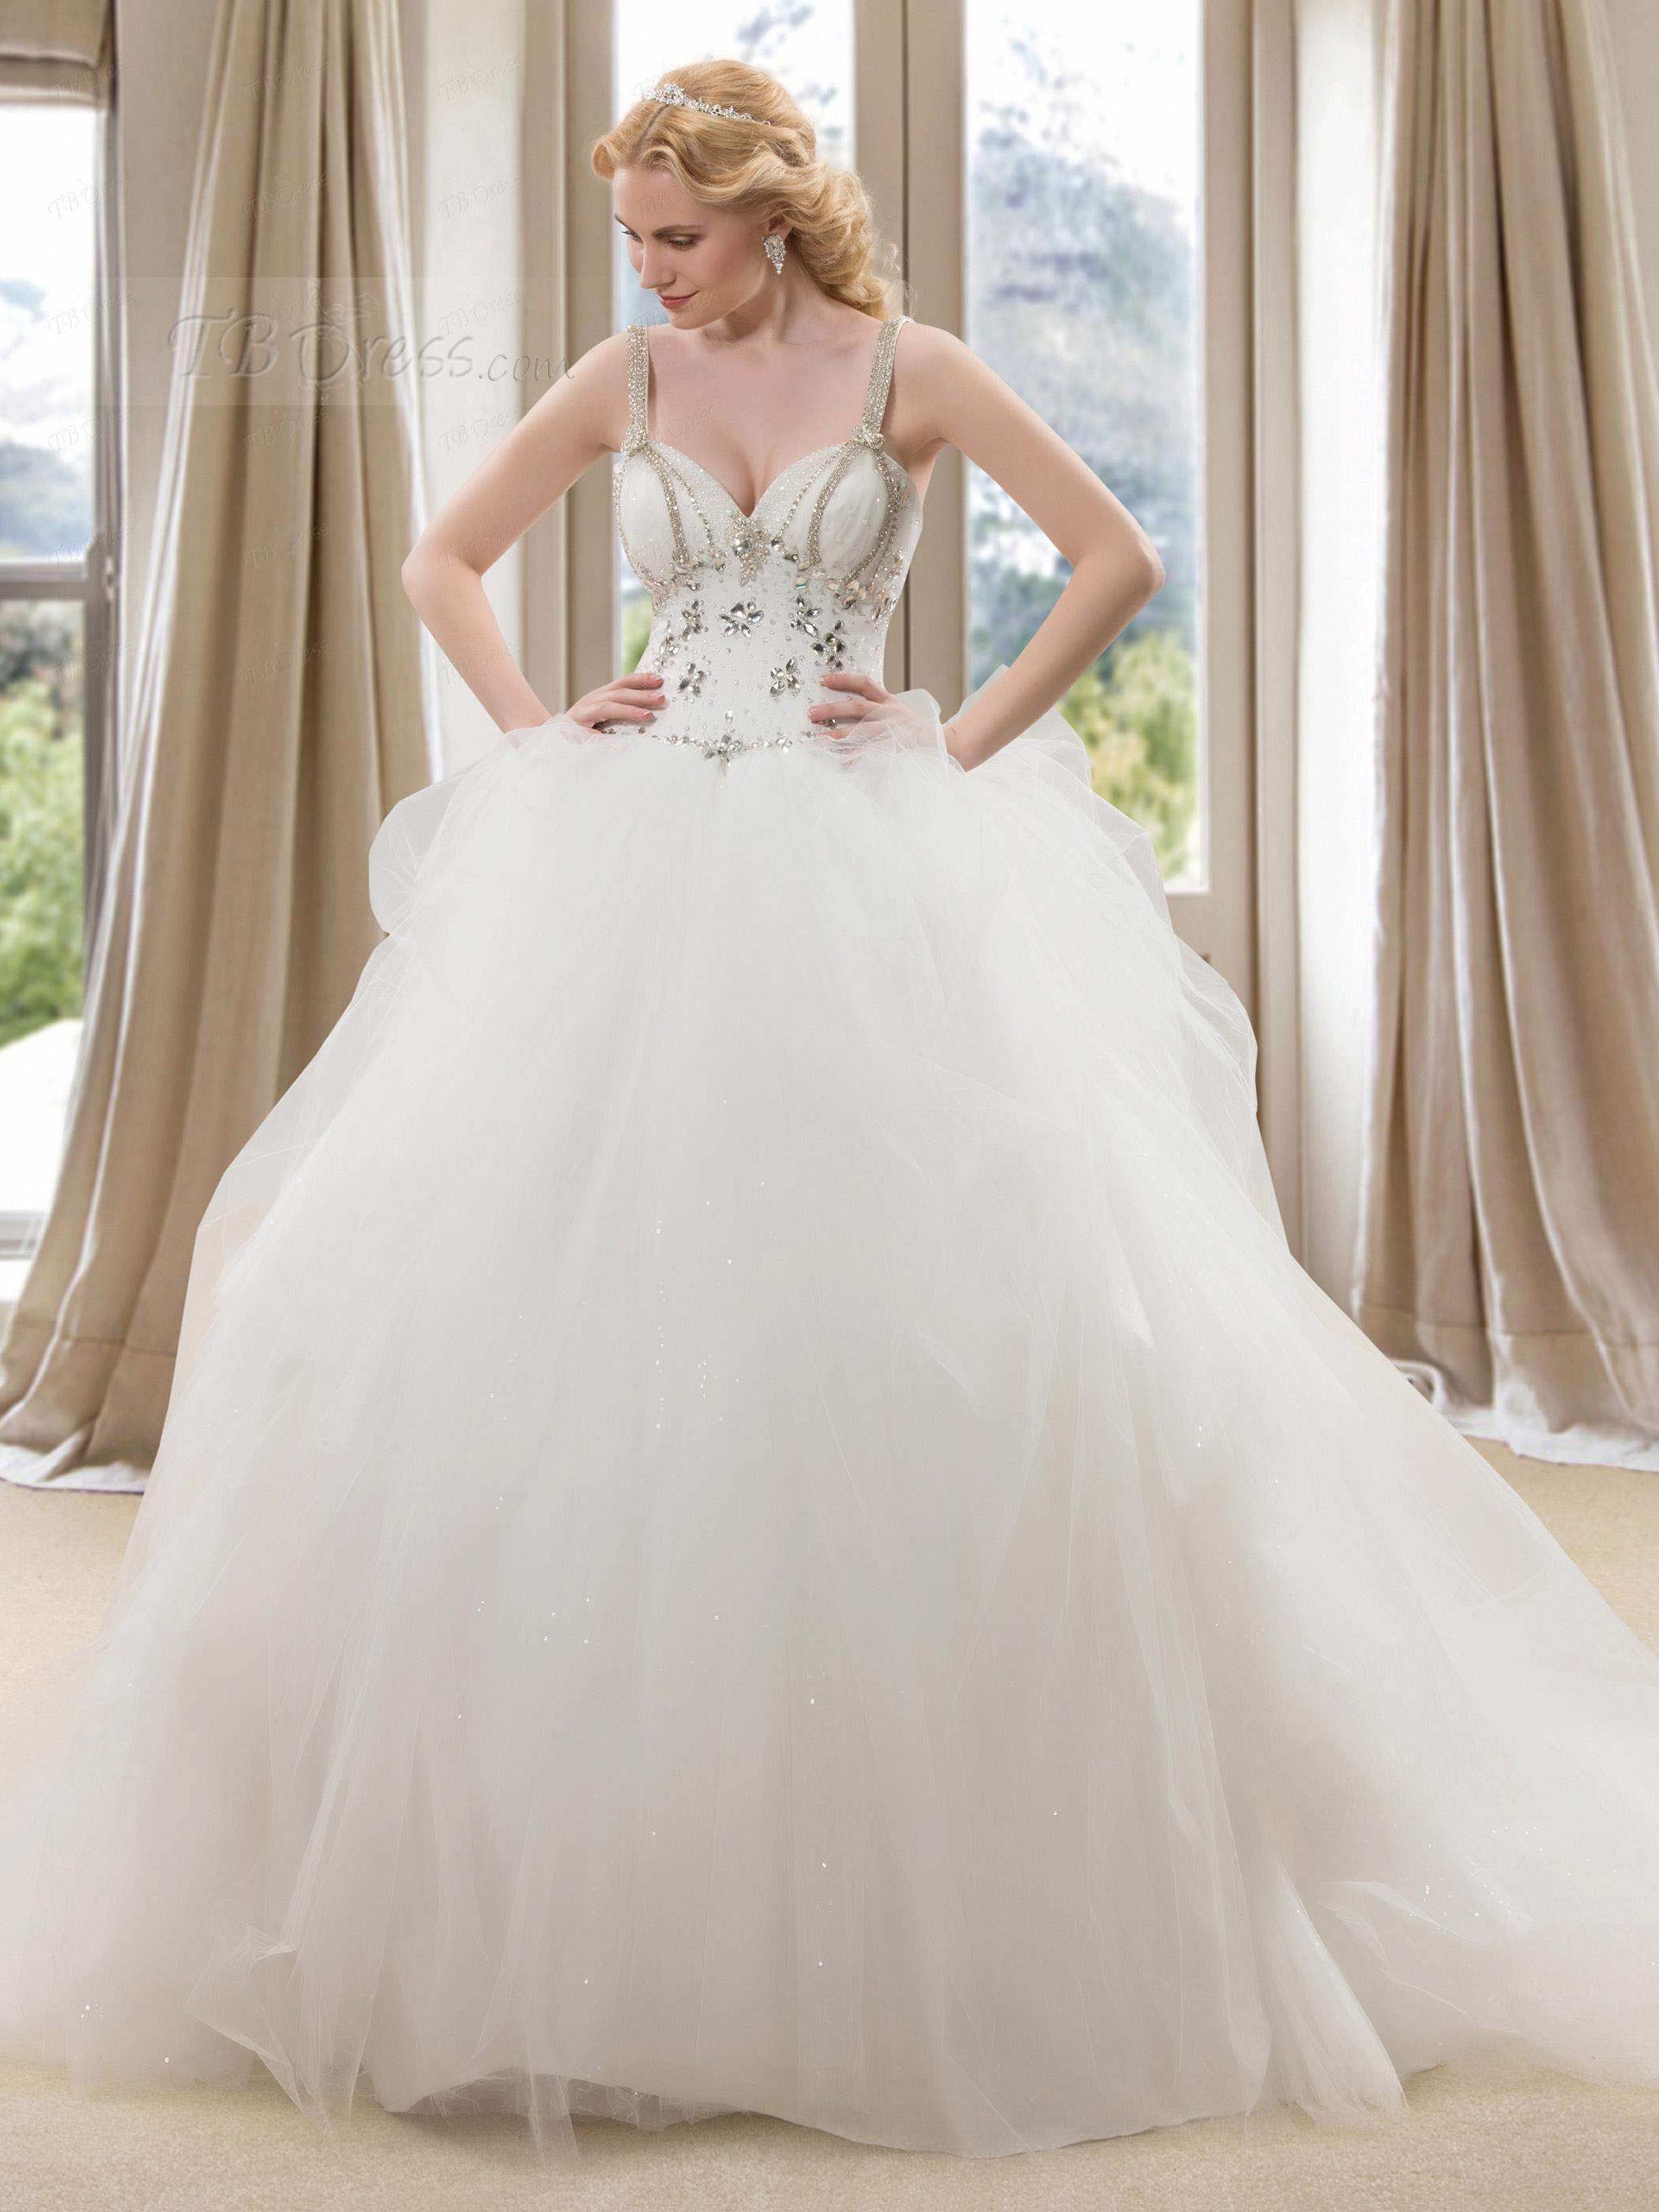 Bling cinderella wedding dresses spaghetti mermaid ruffles for Plus size bling wedding dresses